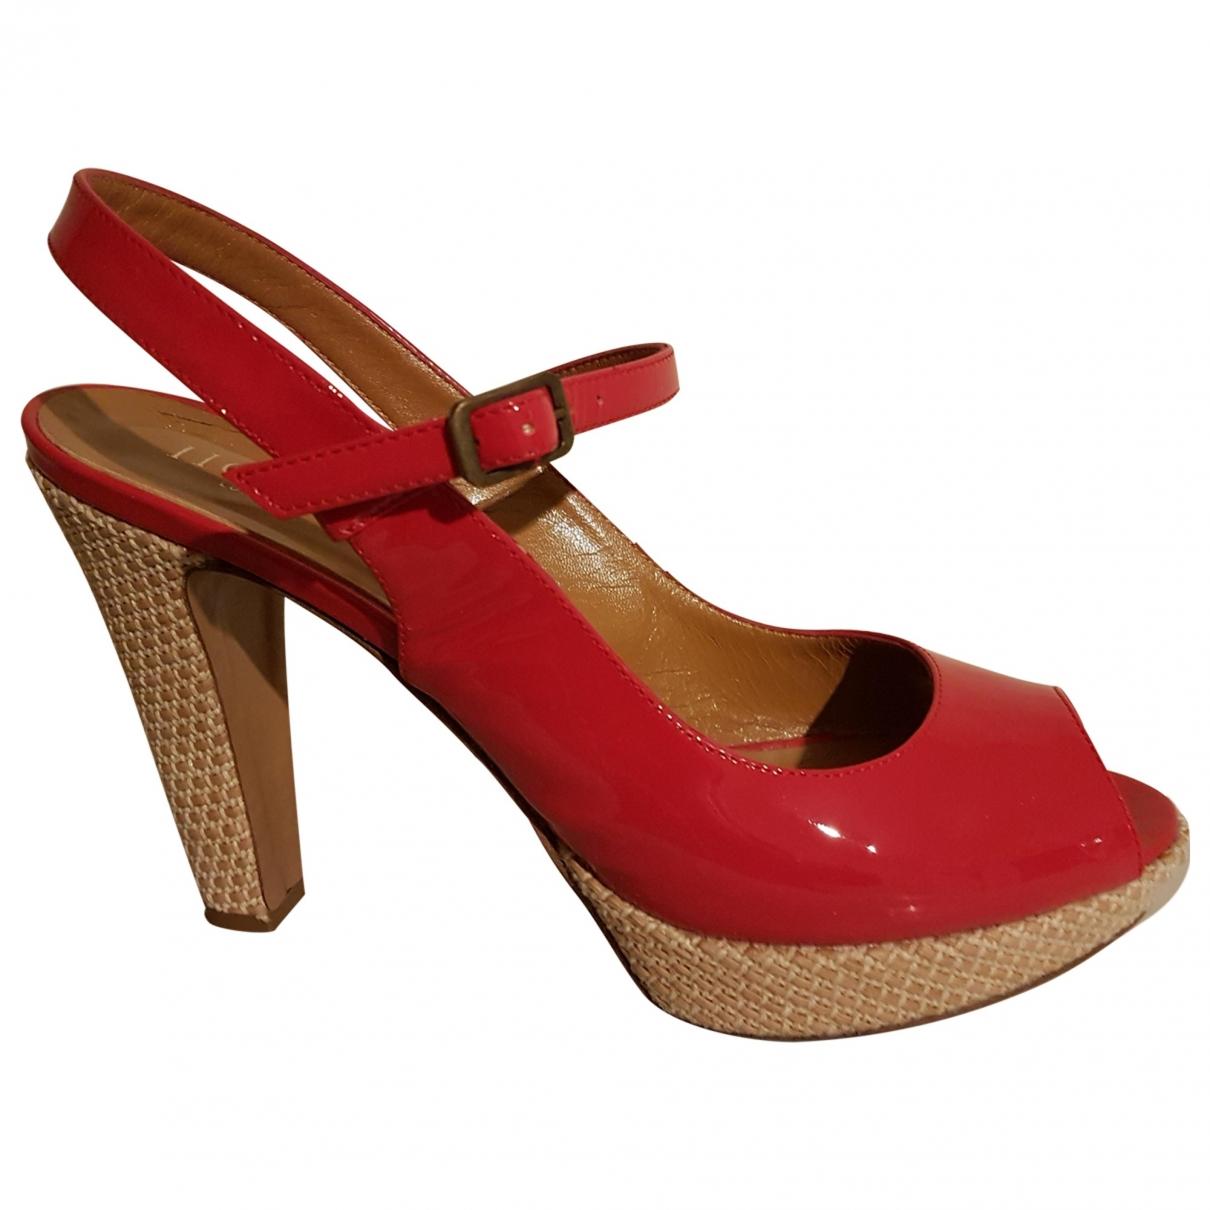 Hobbs - Sandales   pour femme en cuir verni - rouge